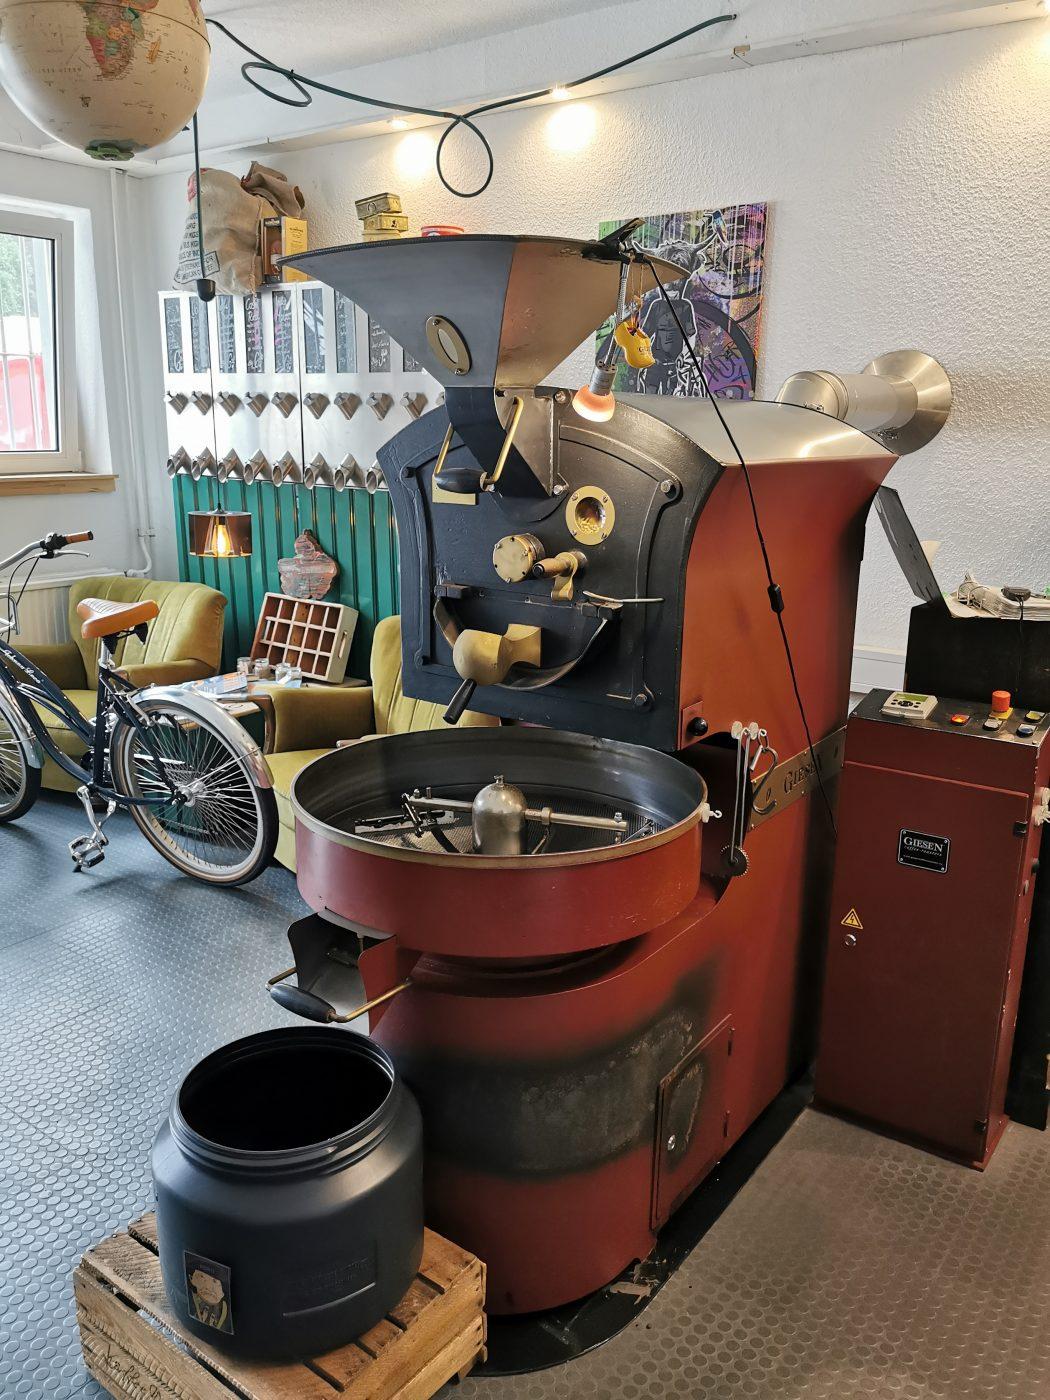 Das Foto zeigt den Trommelröster der Kaffeerösterei ODIBA in Gelsenkirchen